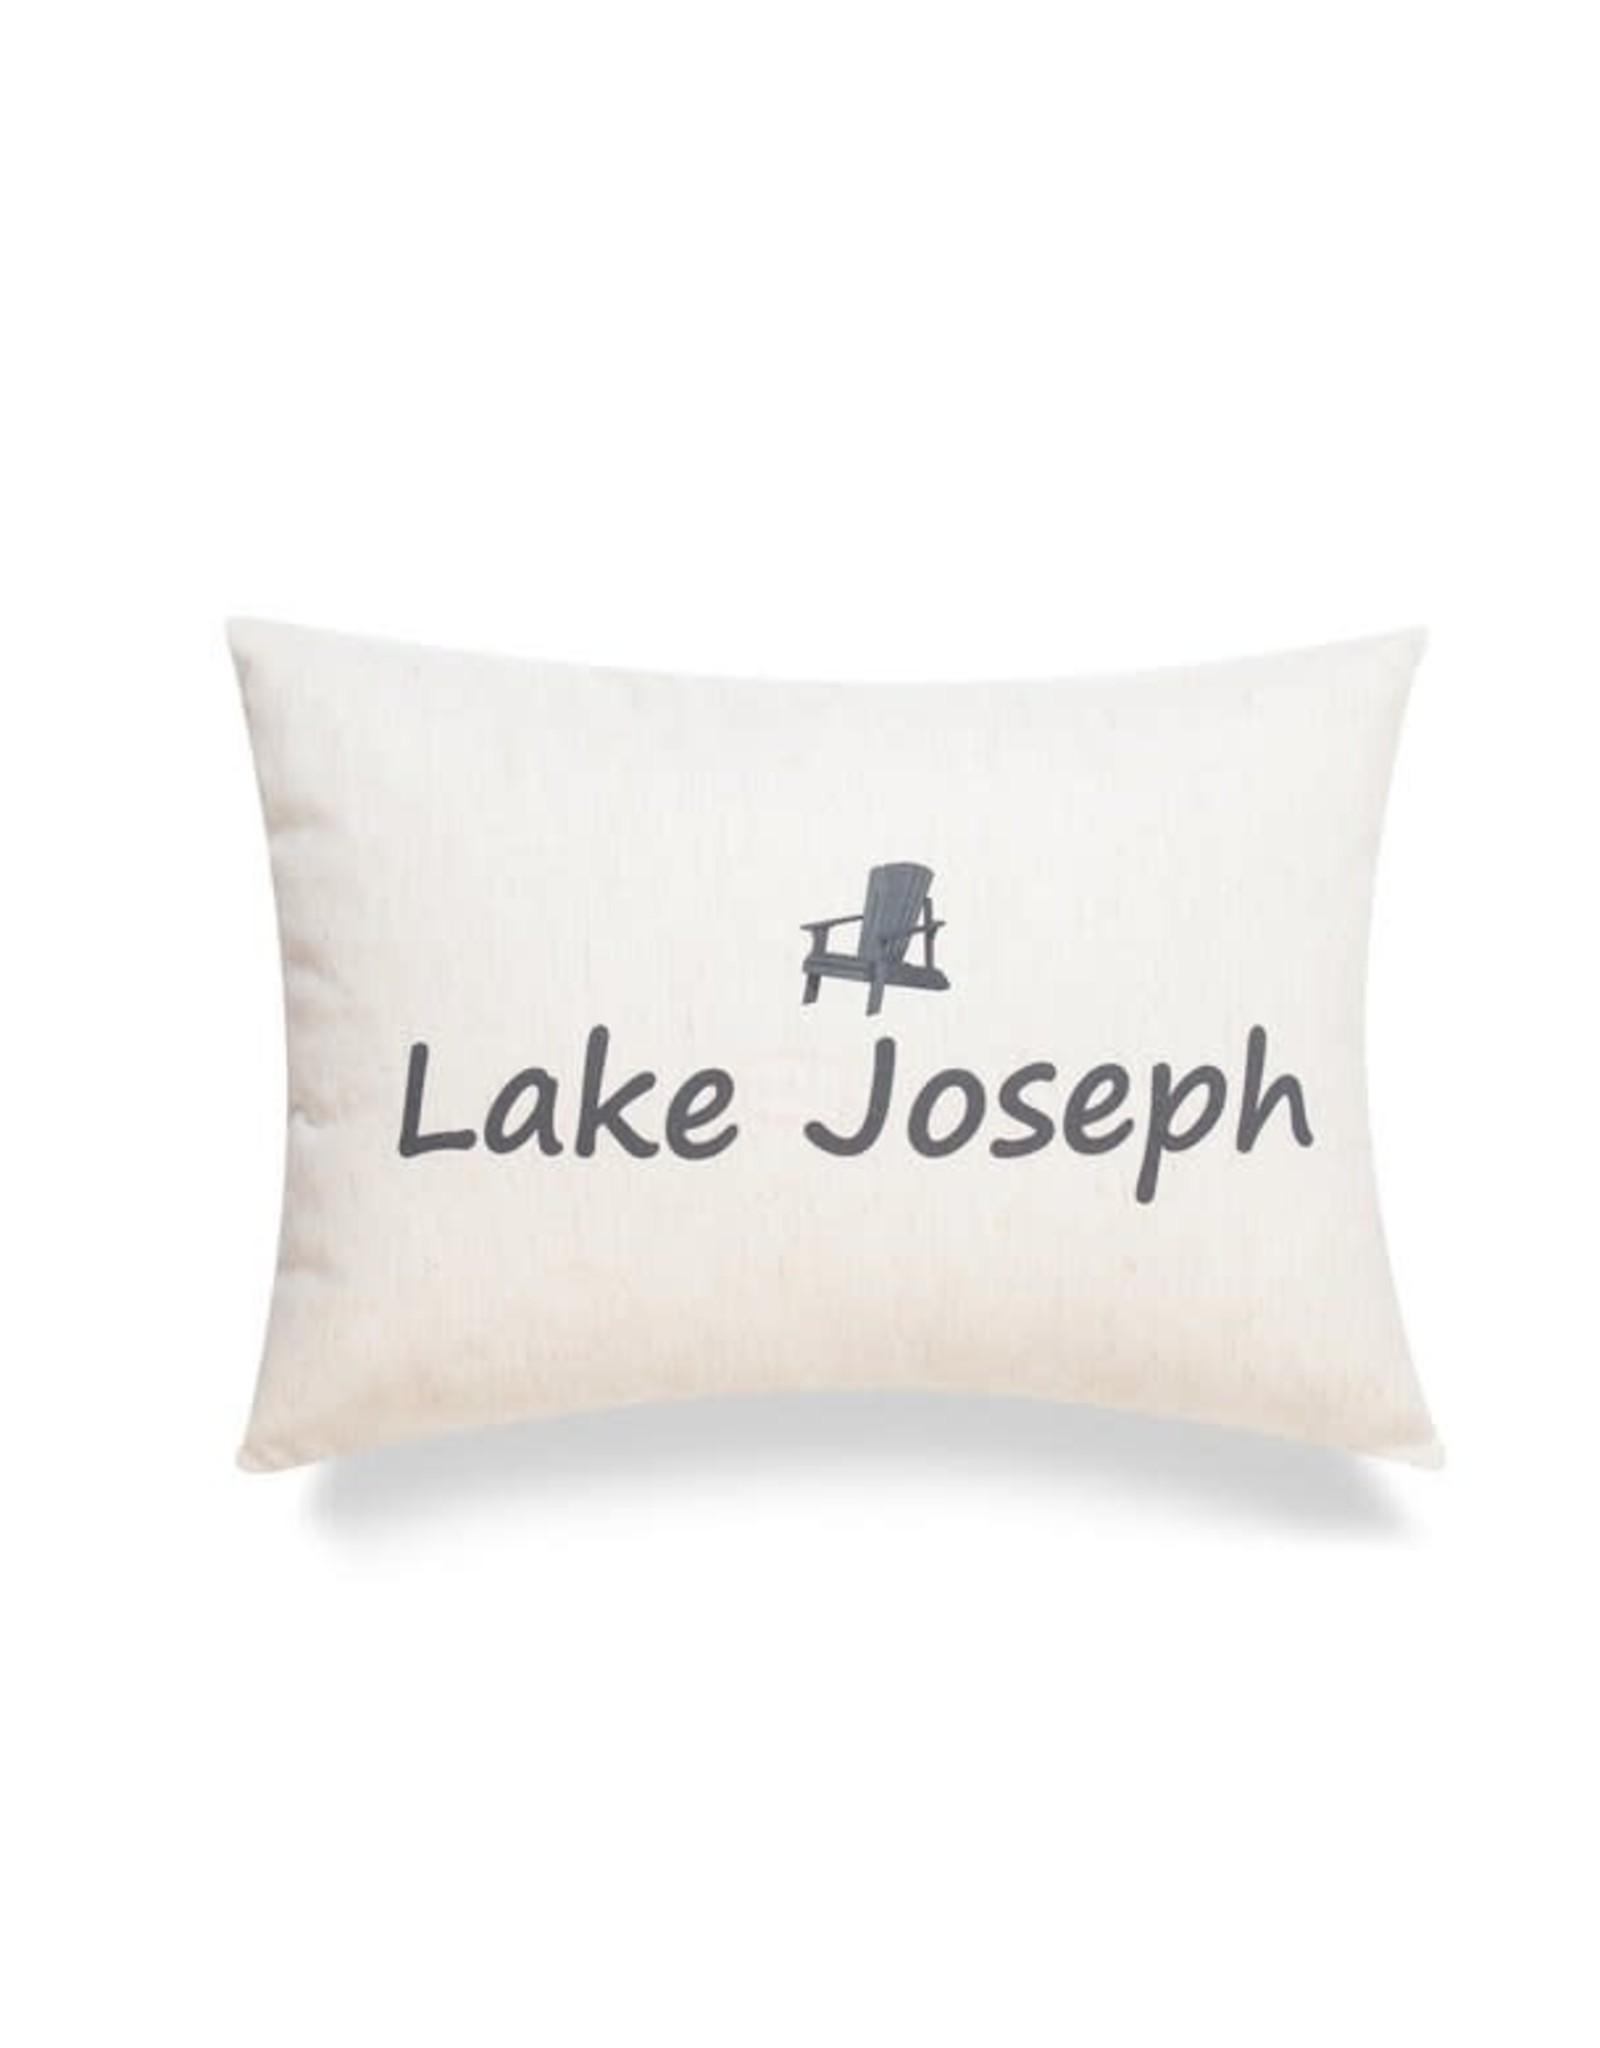 TCE Lumbar Pillow - Lake Joseph